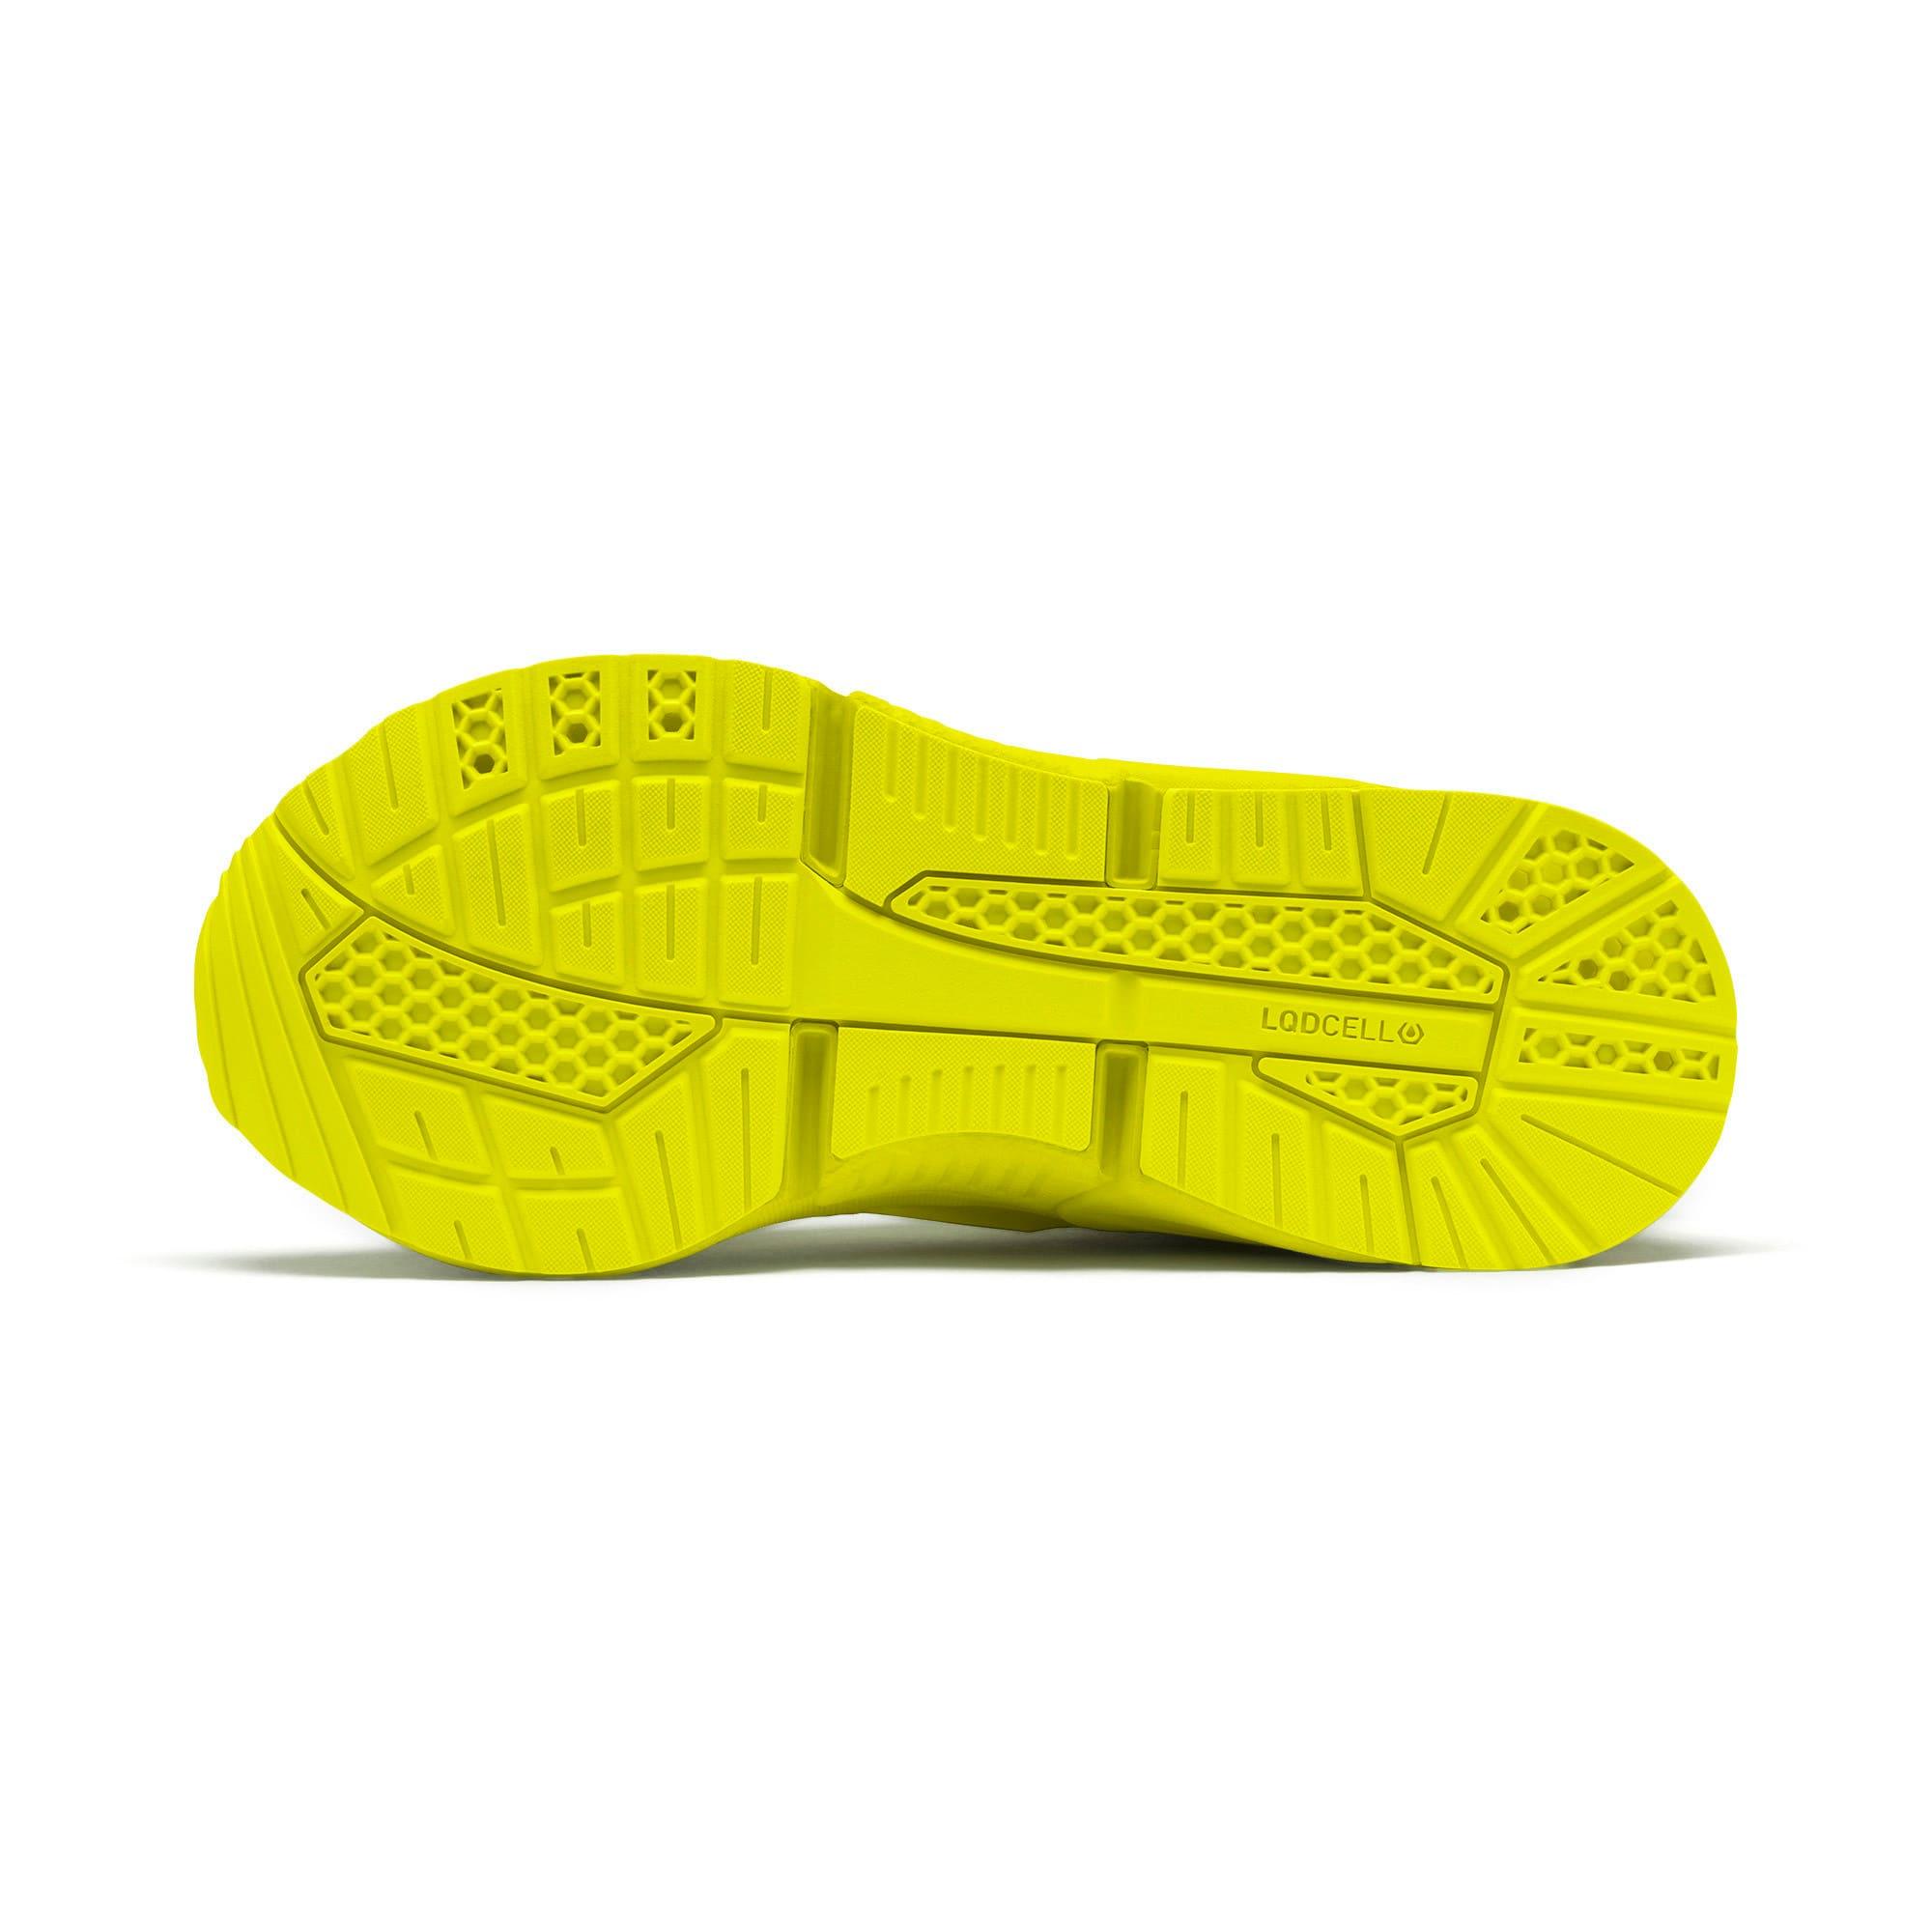 Thumbnail 5 of LQDCELL Optic Sci-Fi Women's Training Shoes, Yellow Alert, medium